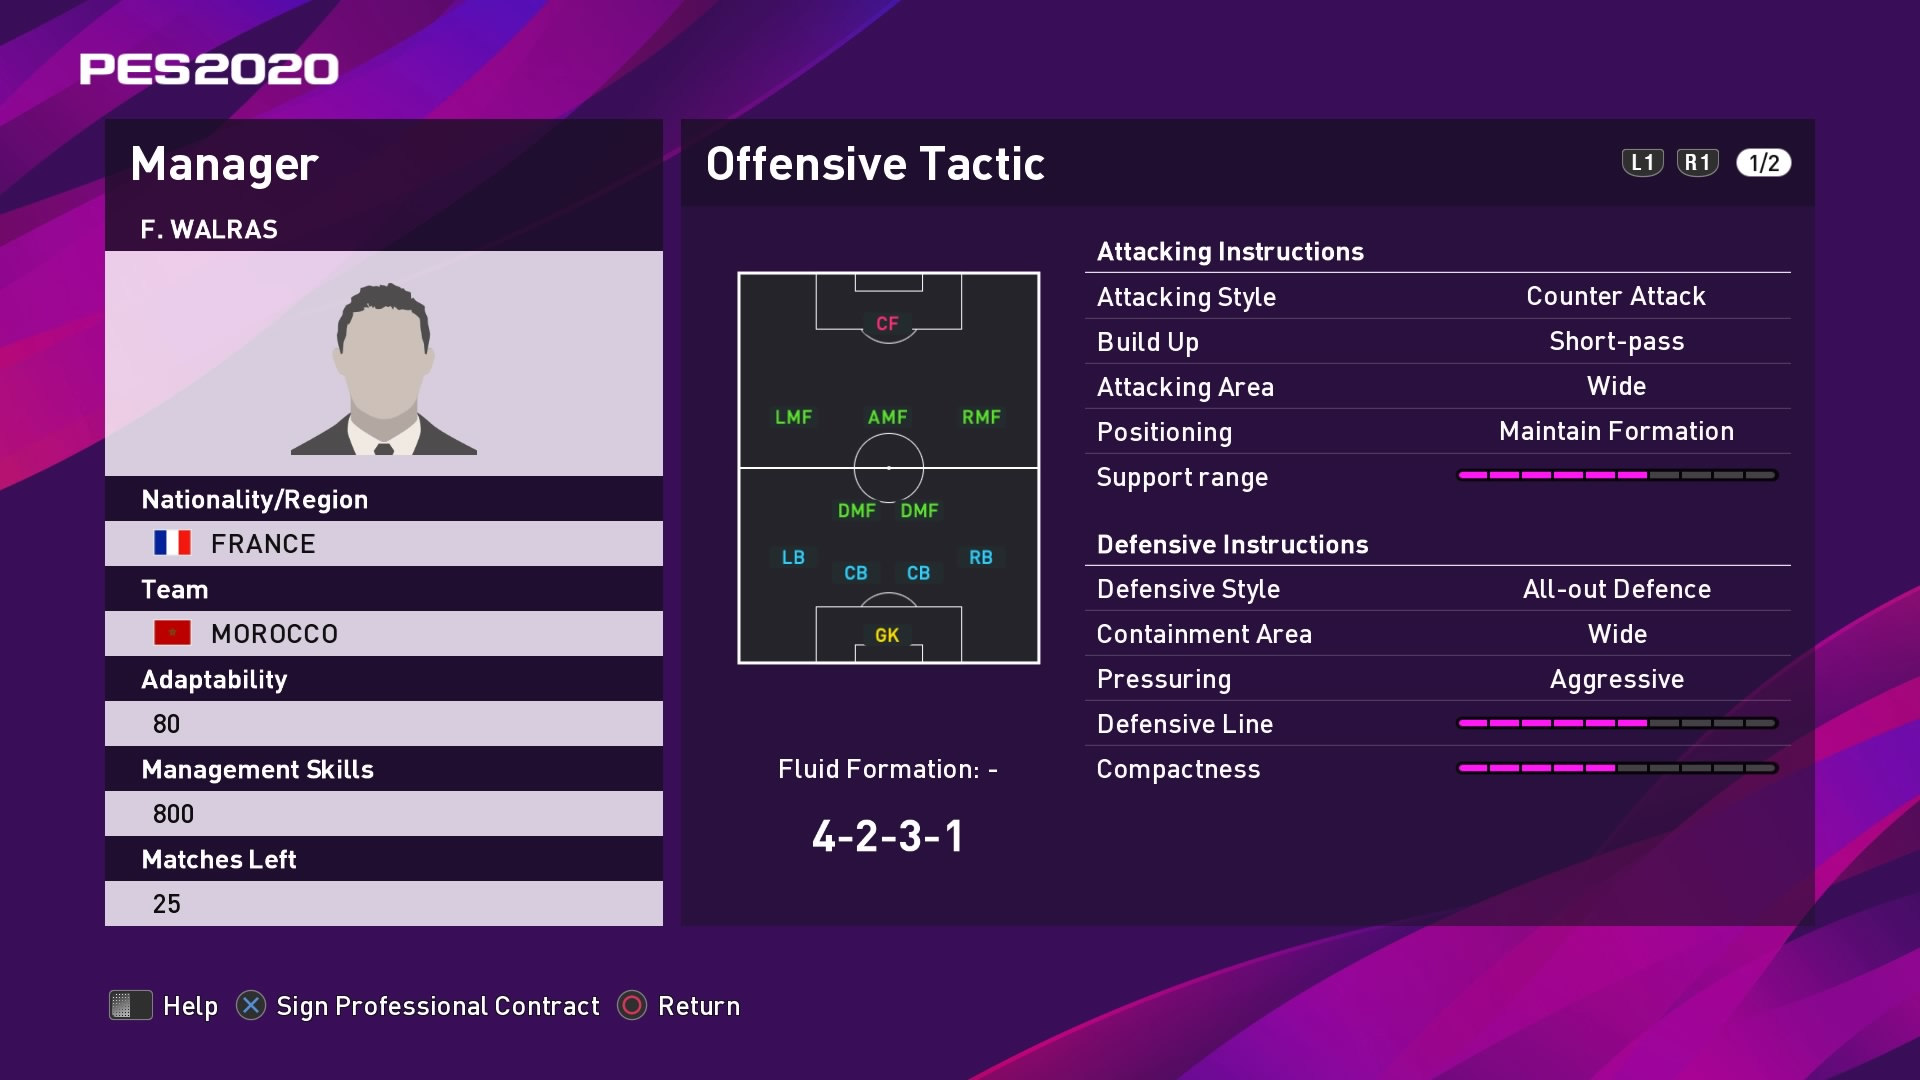 F. Walras (Hervé Renard) Offensive Tactic in PES 2020 myClub